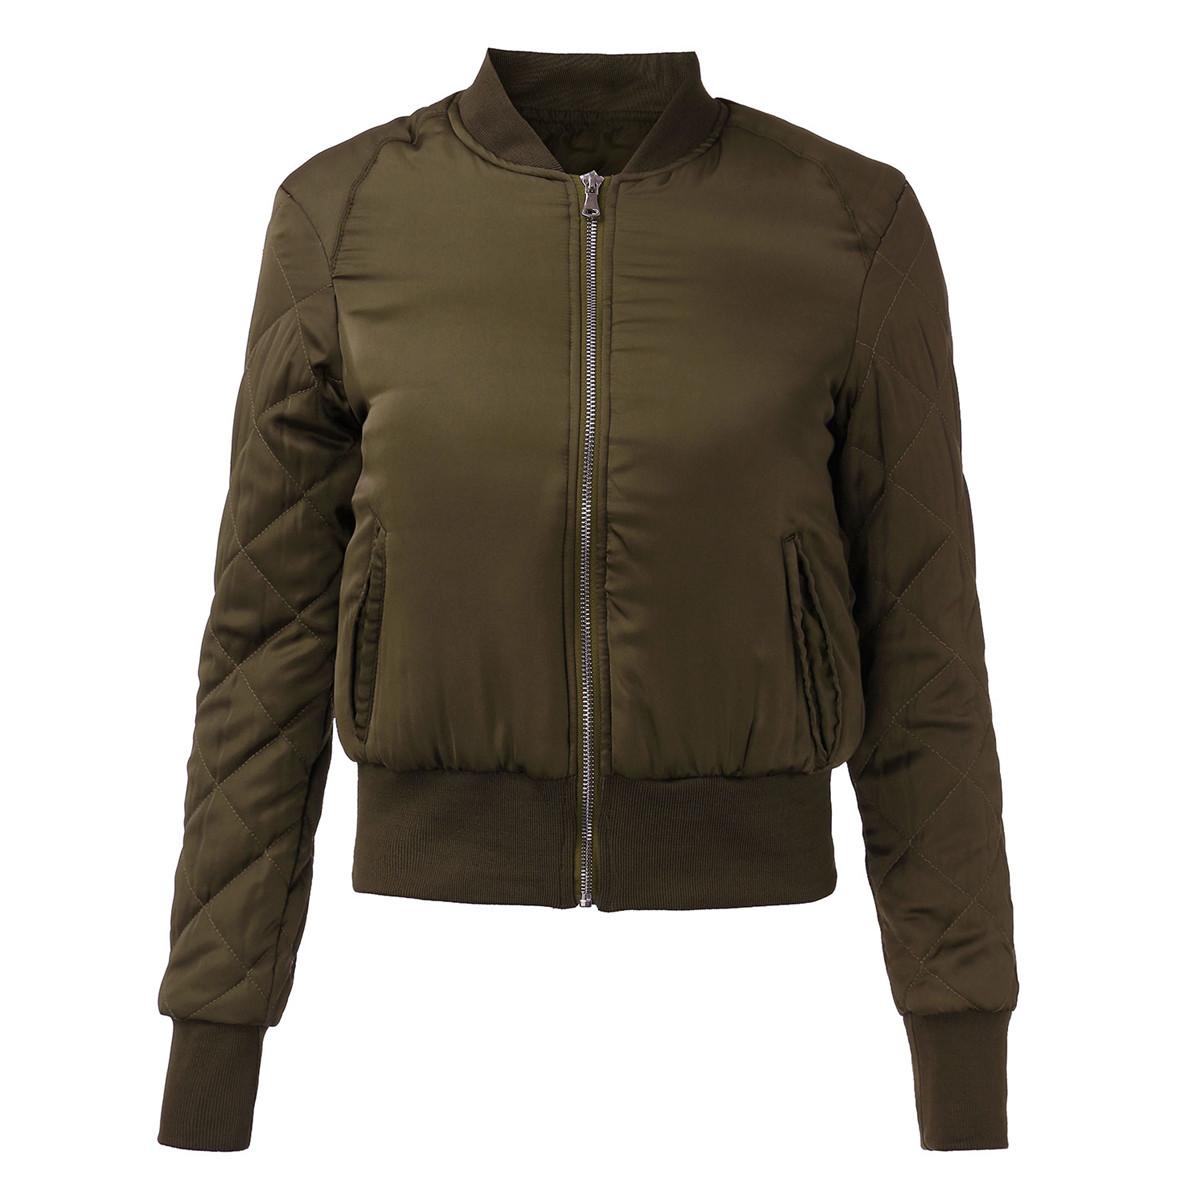 2016 Fashion Women Winter Warm Quilted Zipper Stand Collar Coat Jacket Padded Bomber Fleece ...